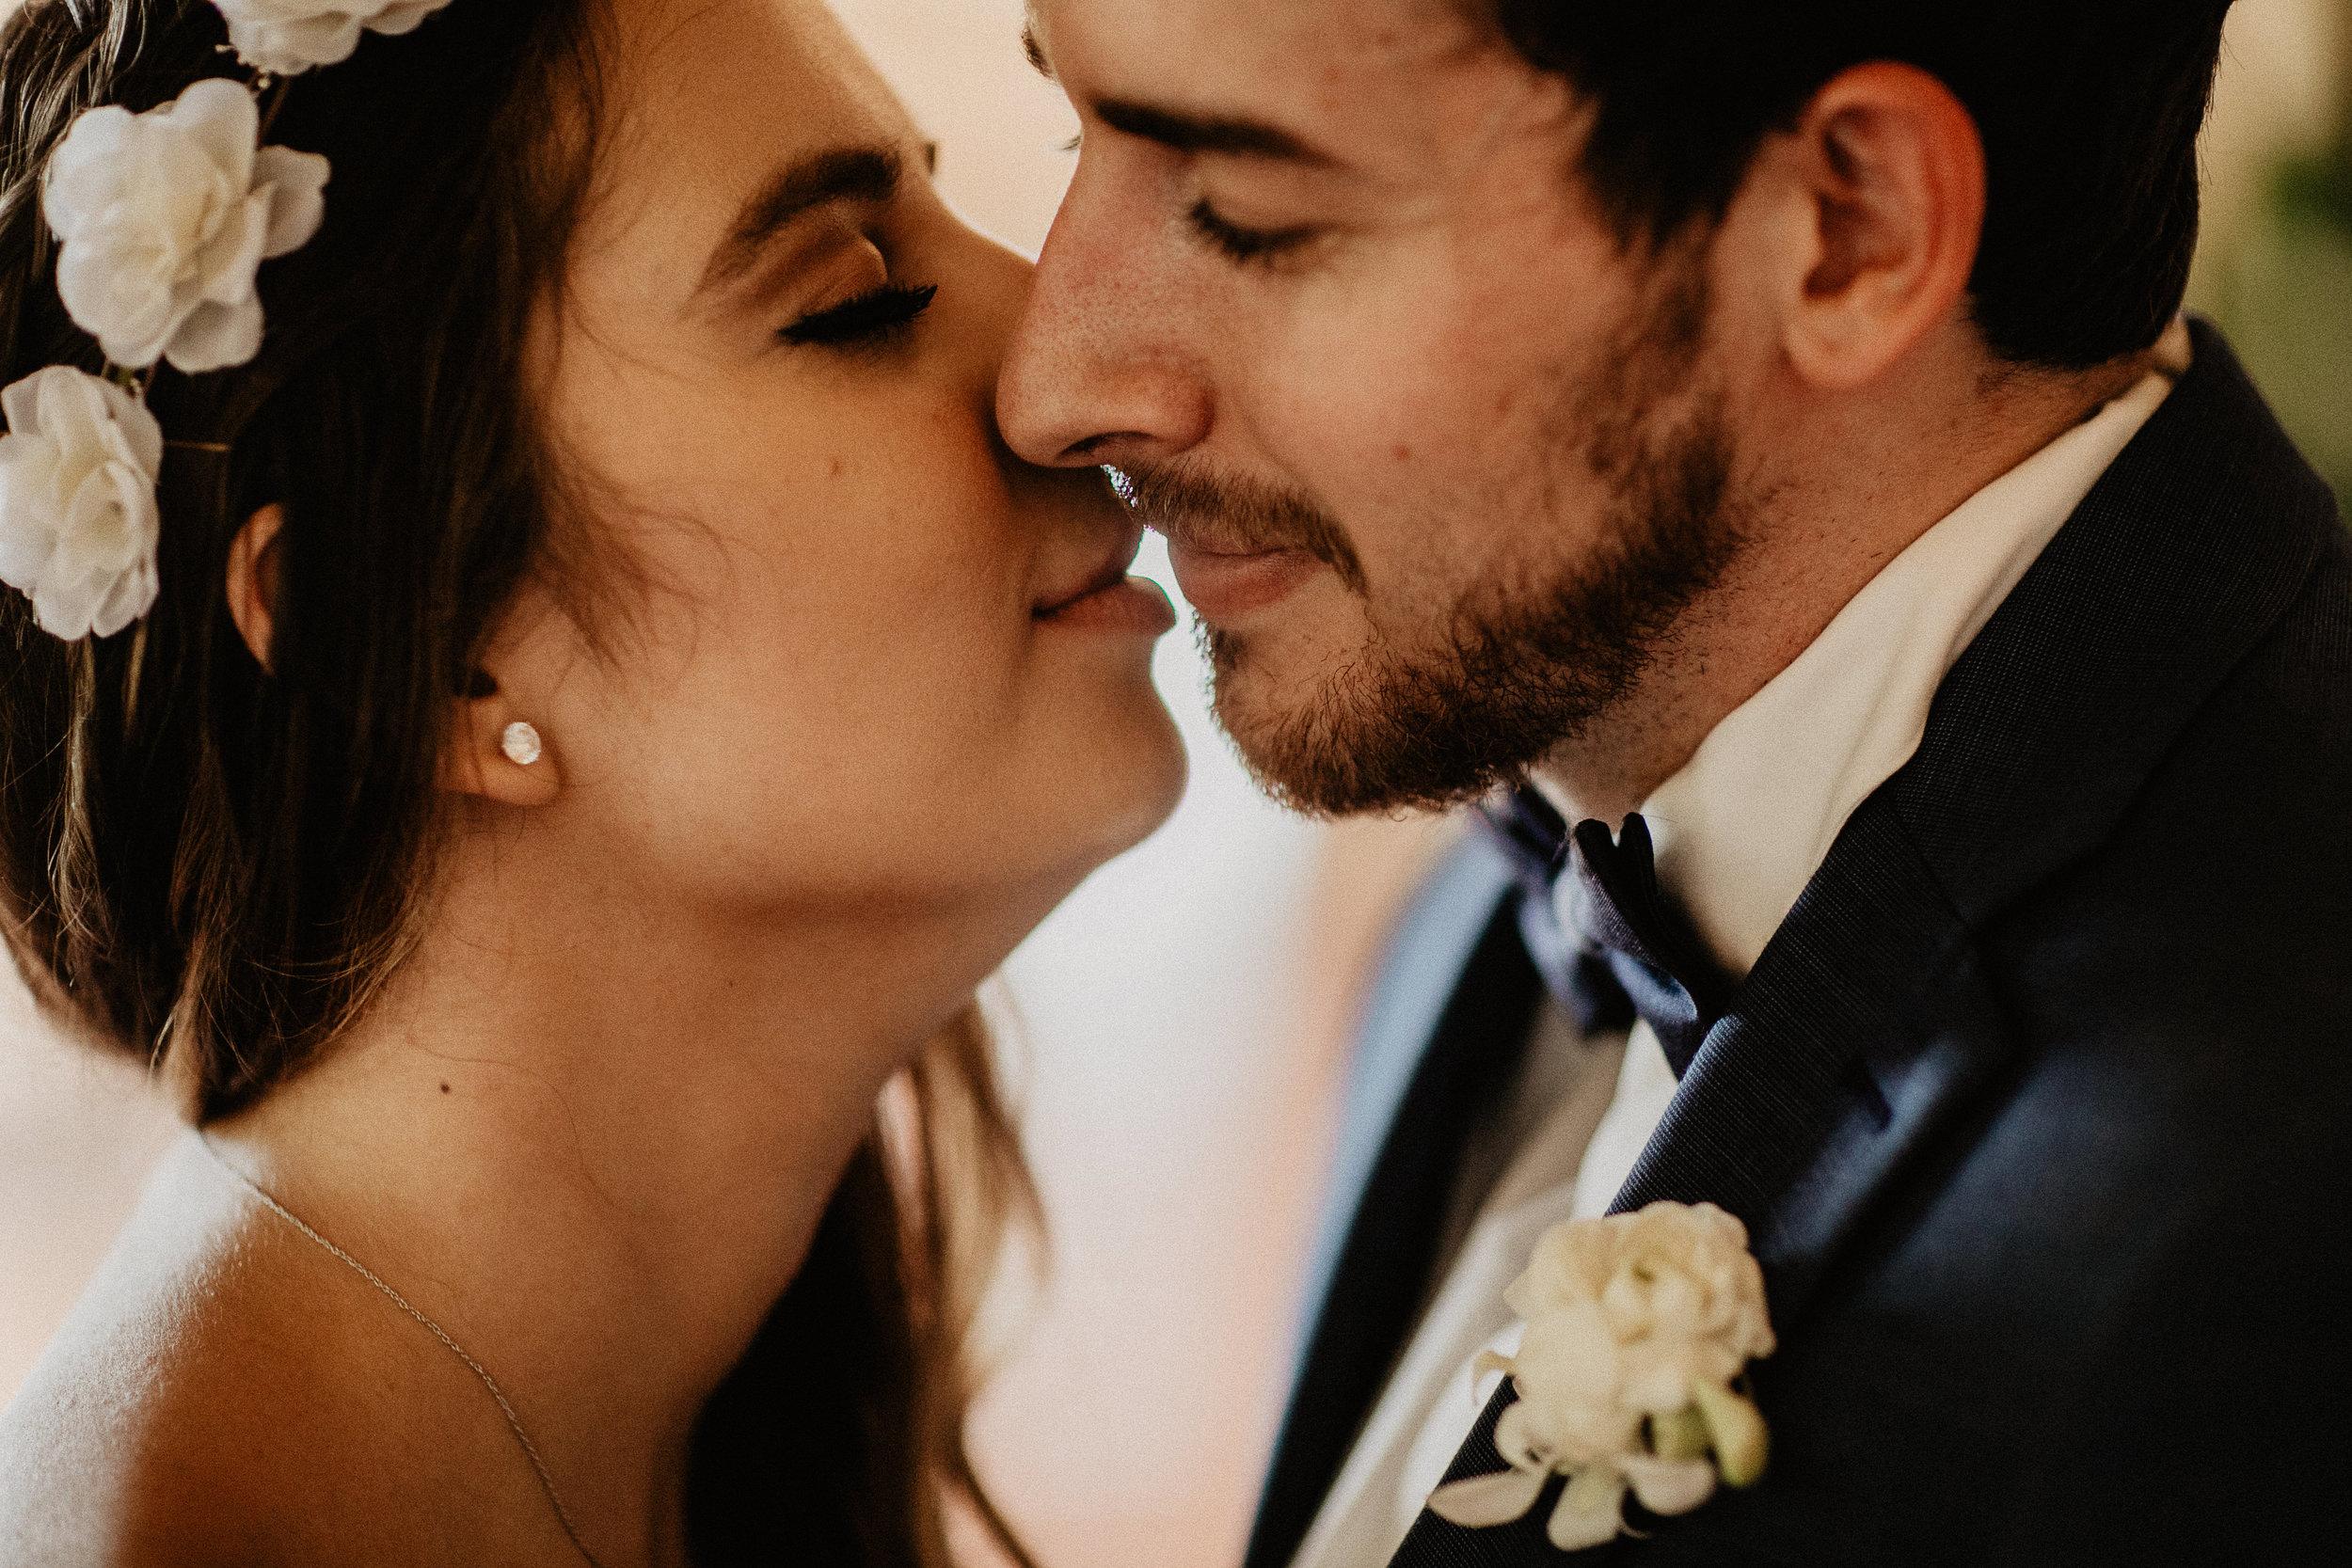 alfonso_flores_destination_wedding_photography_puerto_vallarta_hotel_barcelo_vallarta_cuttler_amela-336.JPG